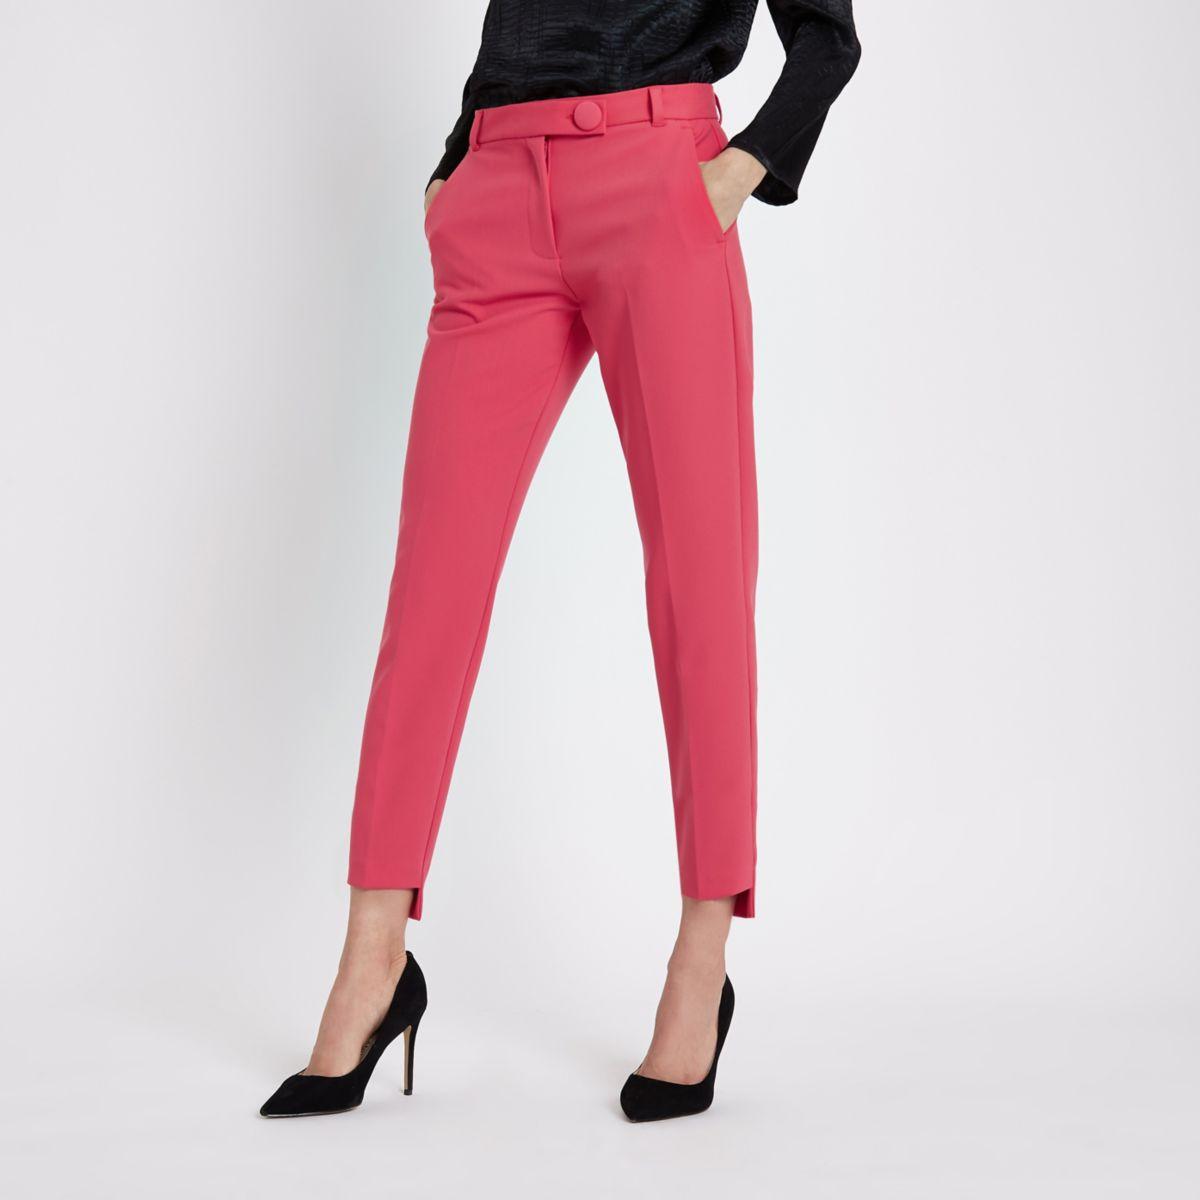 Pink step hem cigarette pants